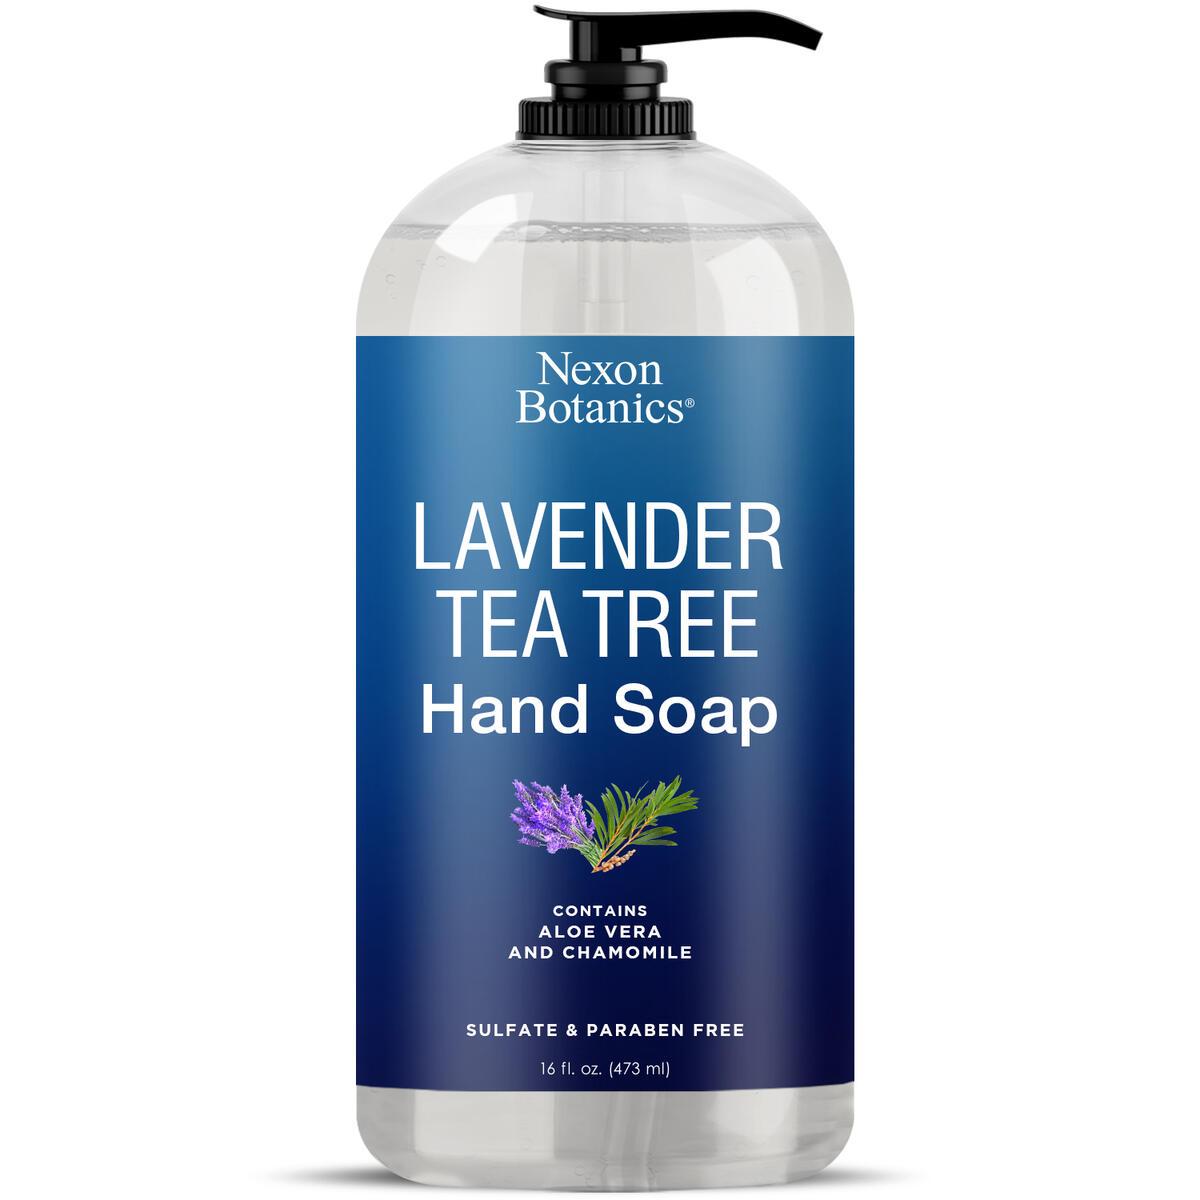 Lavender Tea Tree Hand Soap